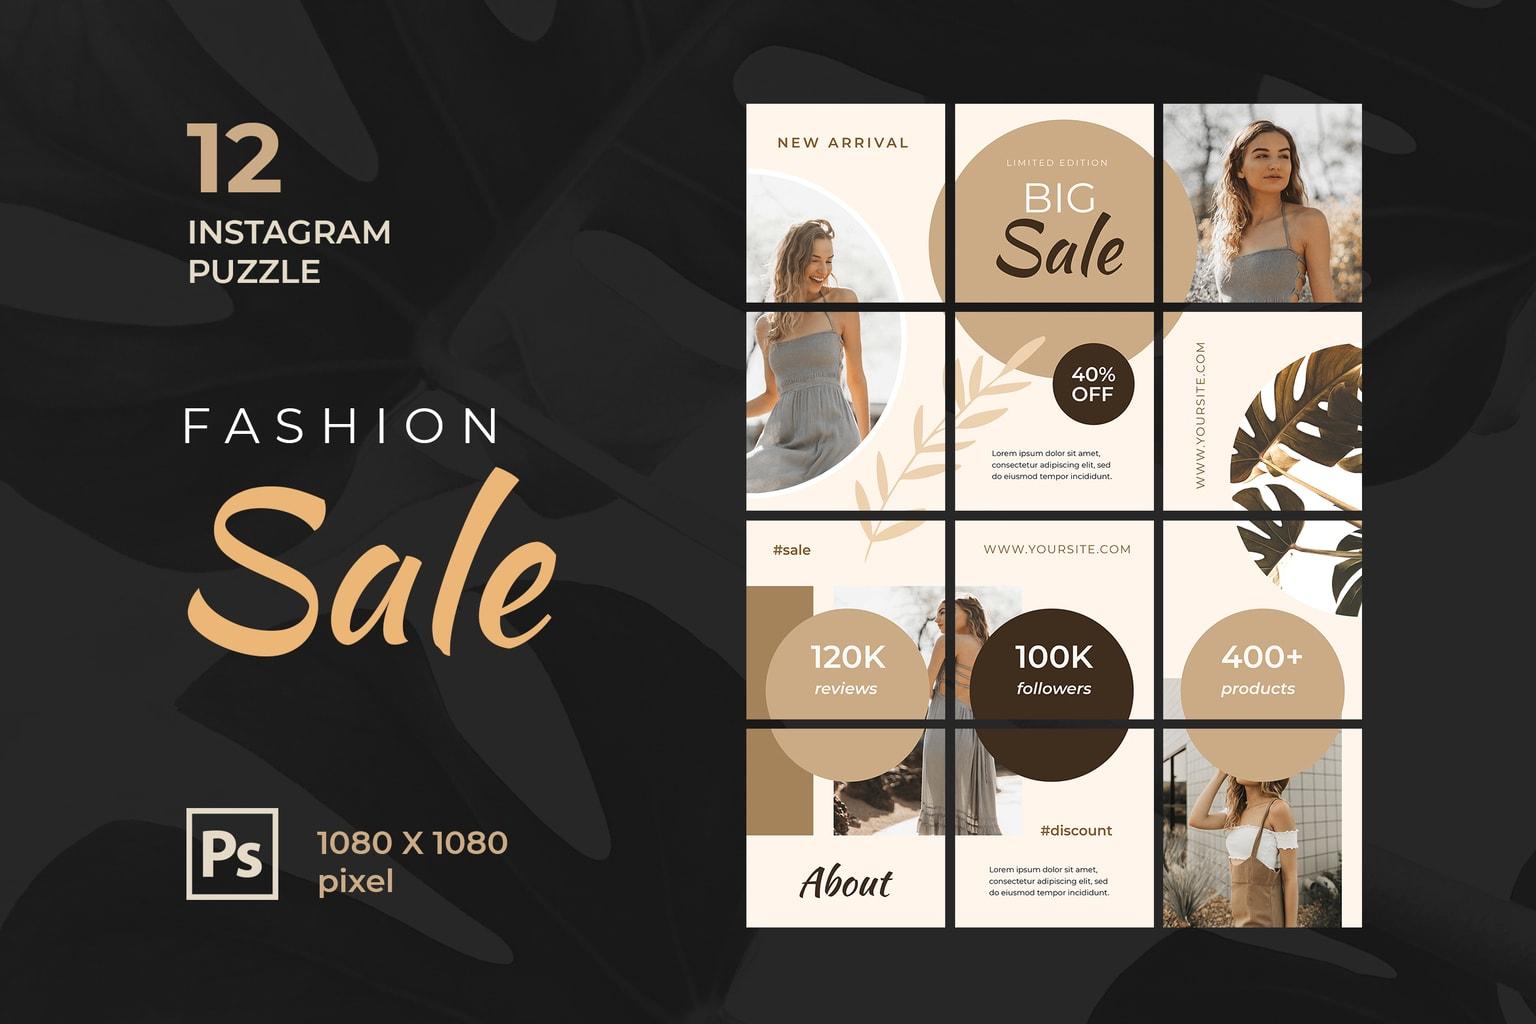 instagram puzzle – big sale edition